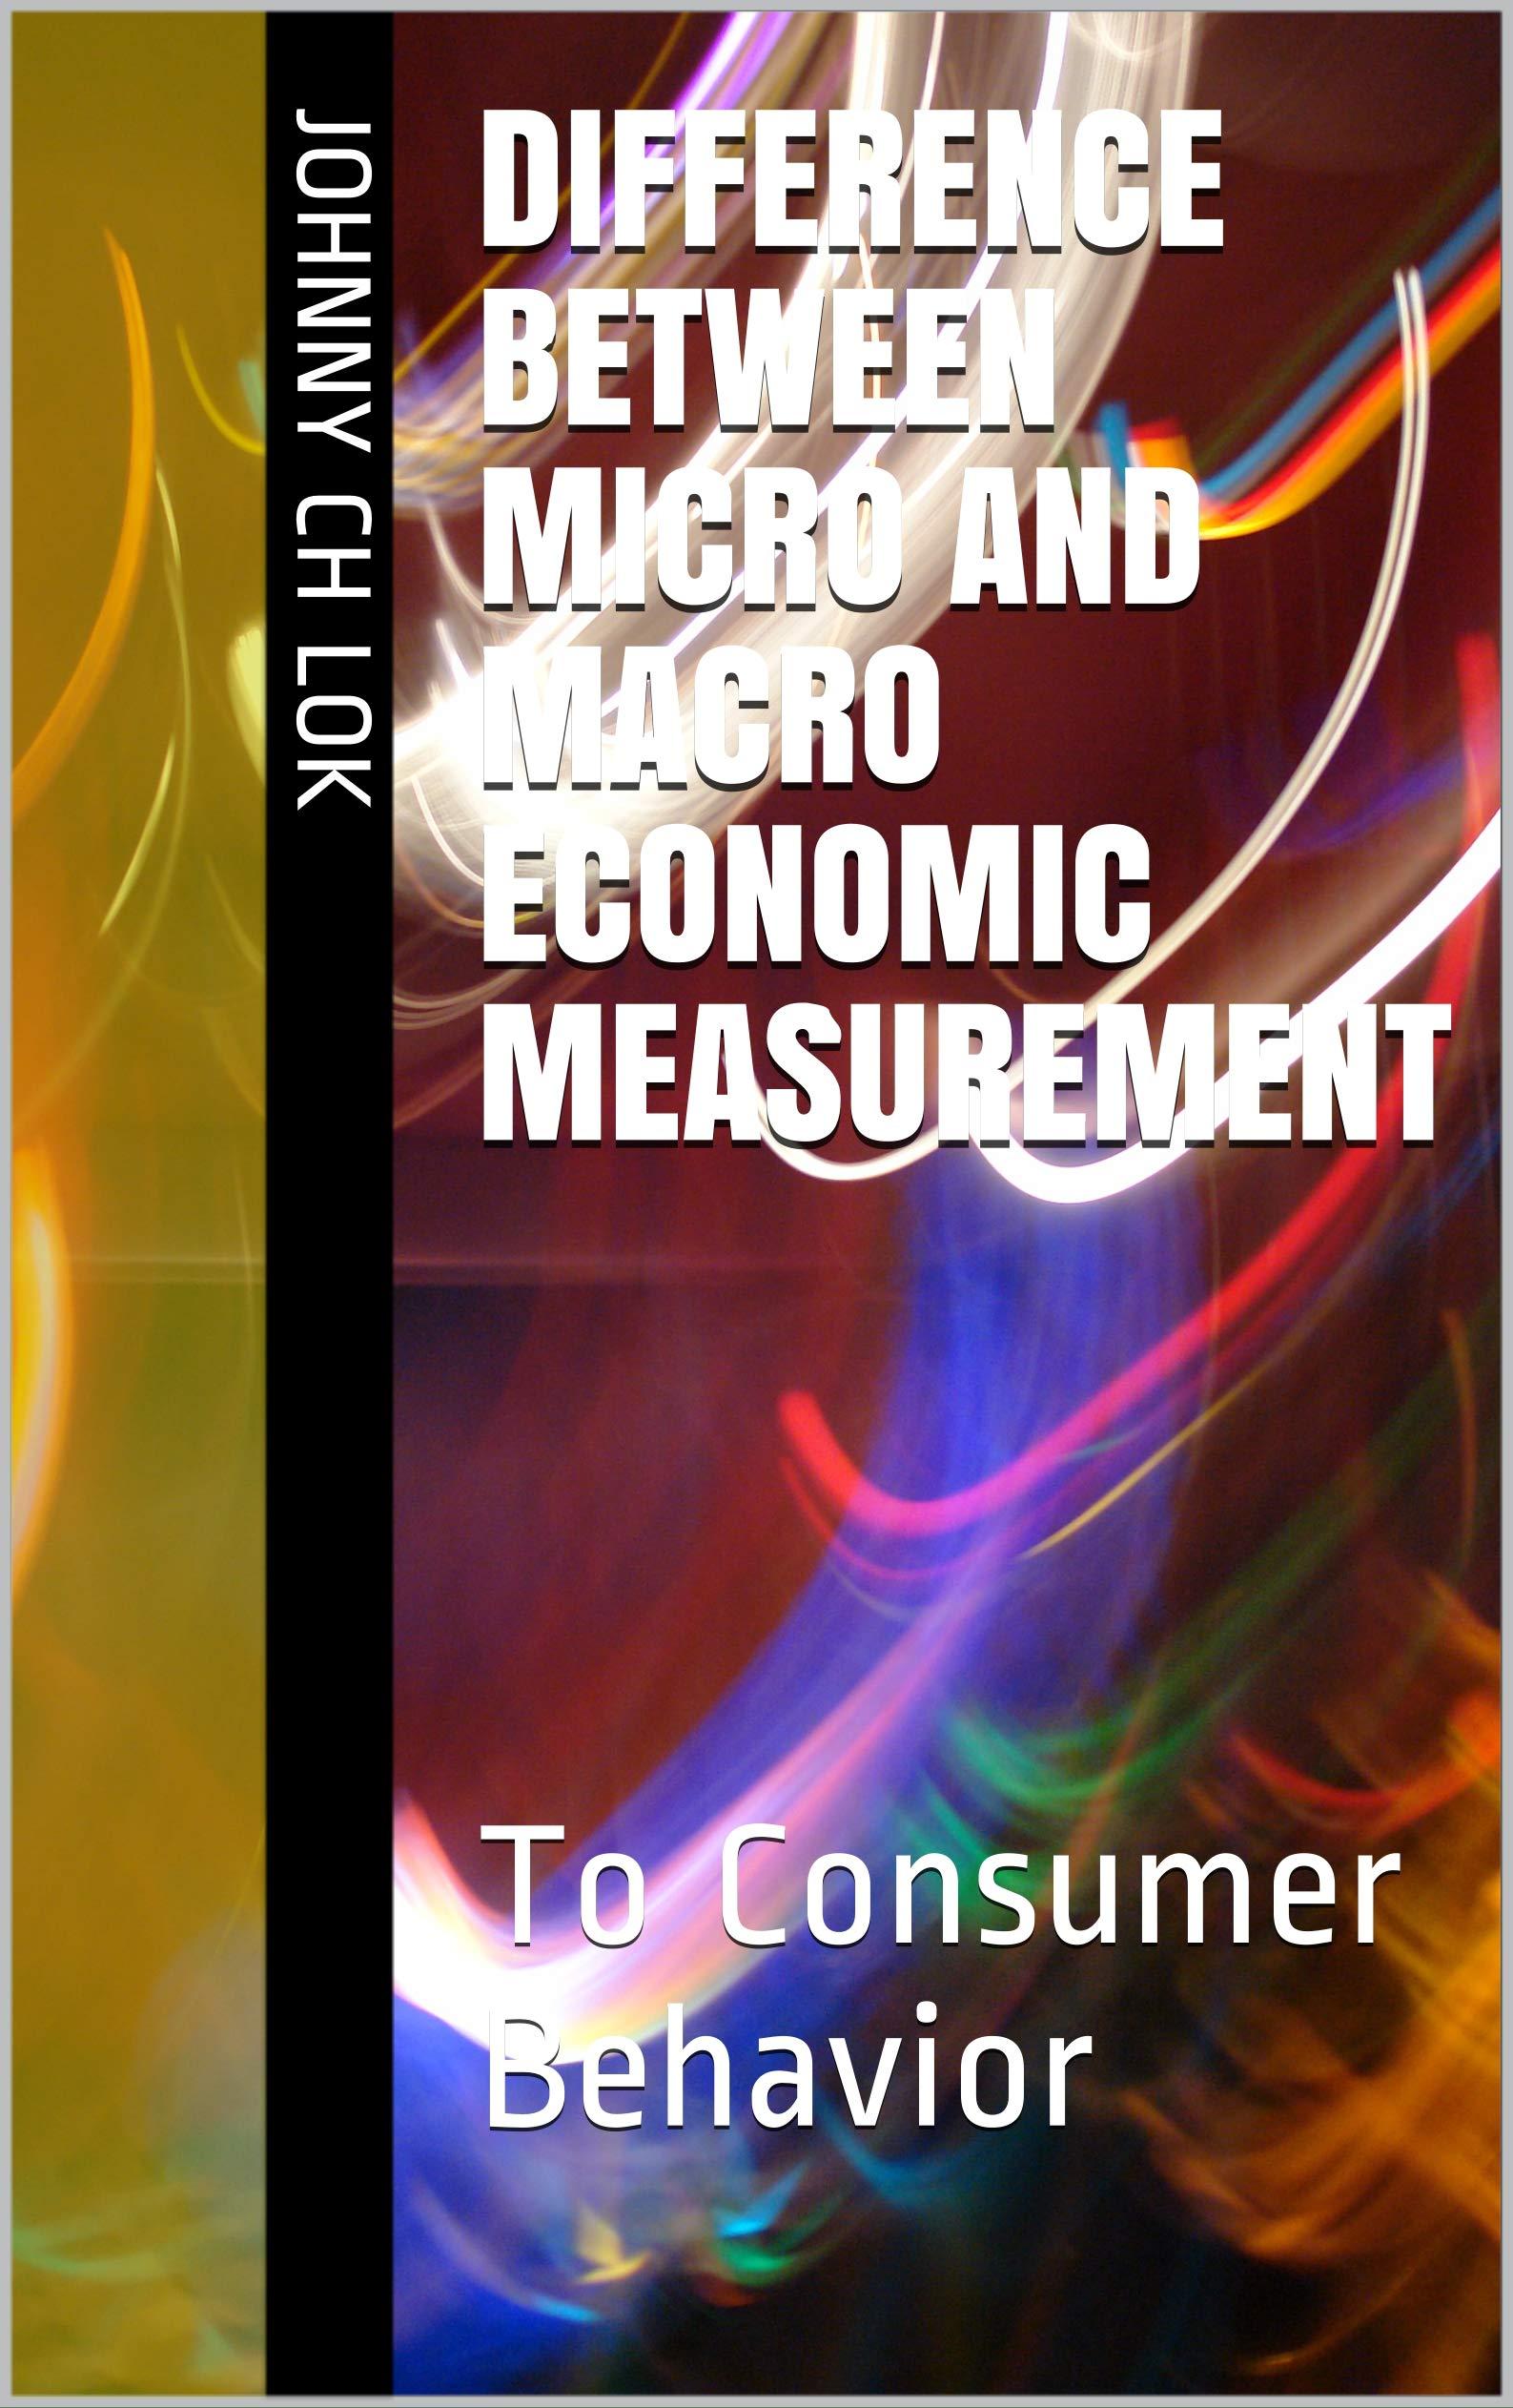 Difference Between Micro And Macro Economic Measurement: To Consumer Behavior